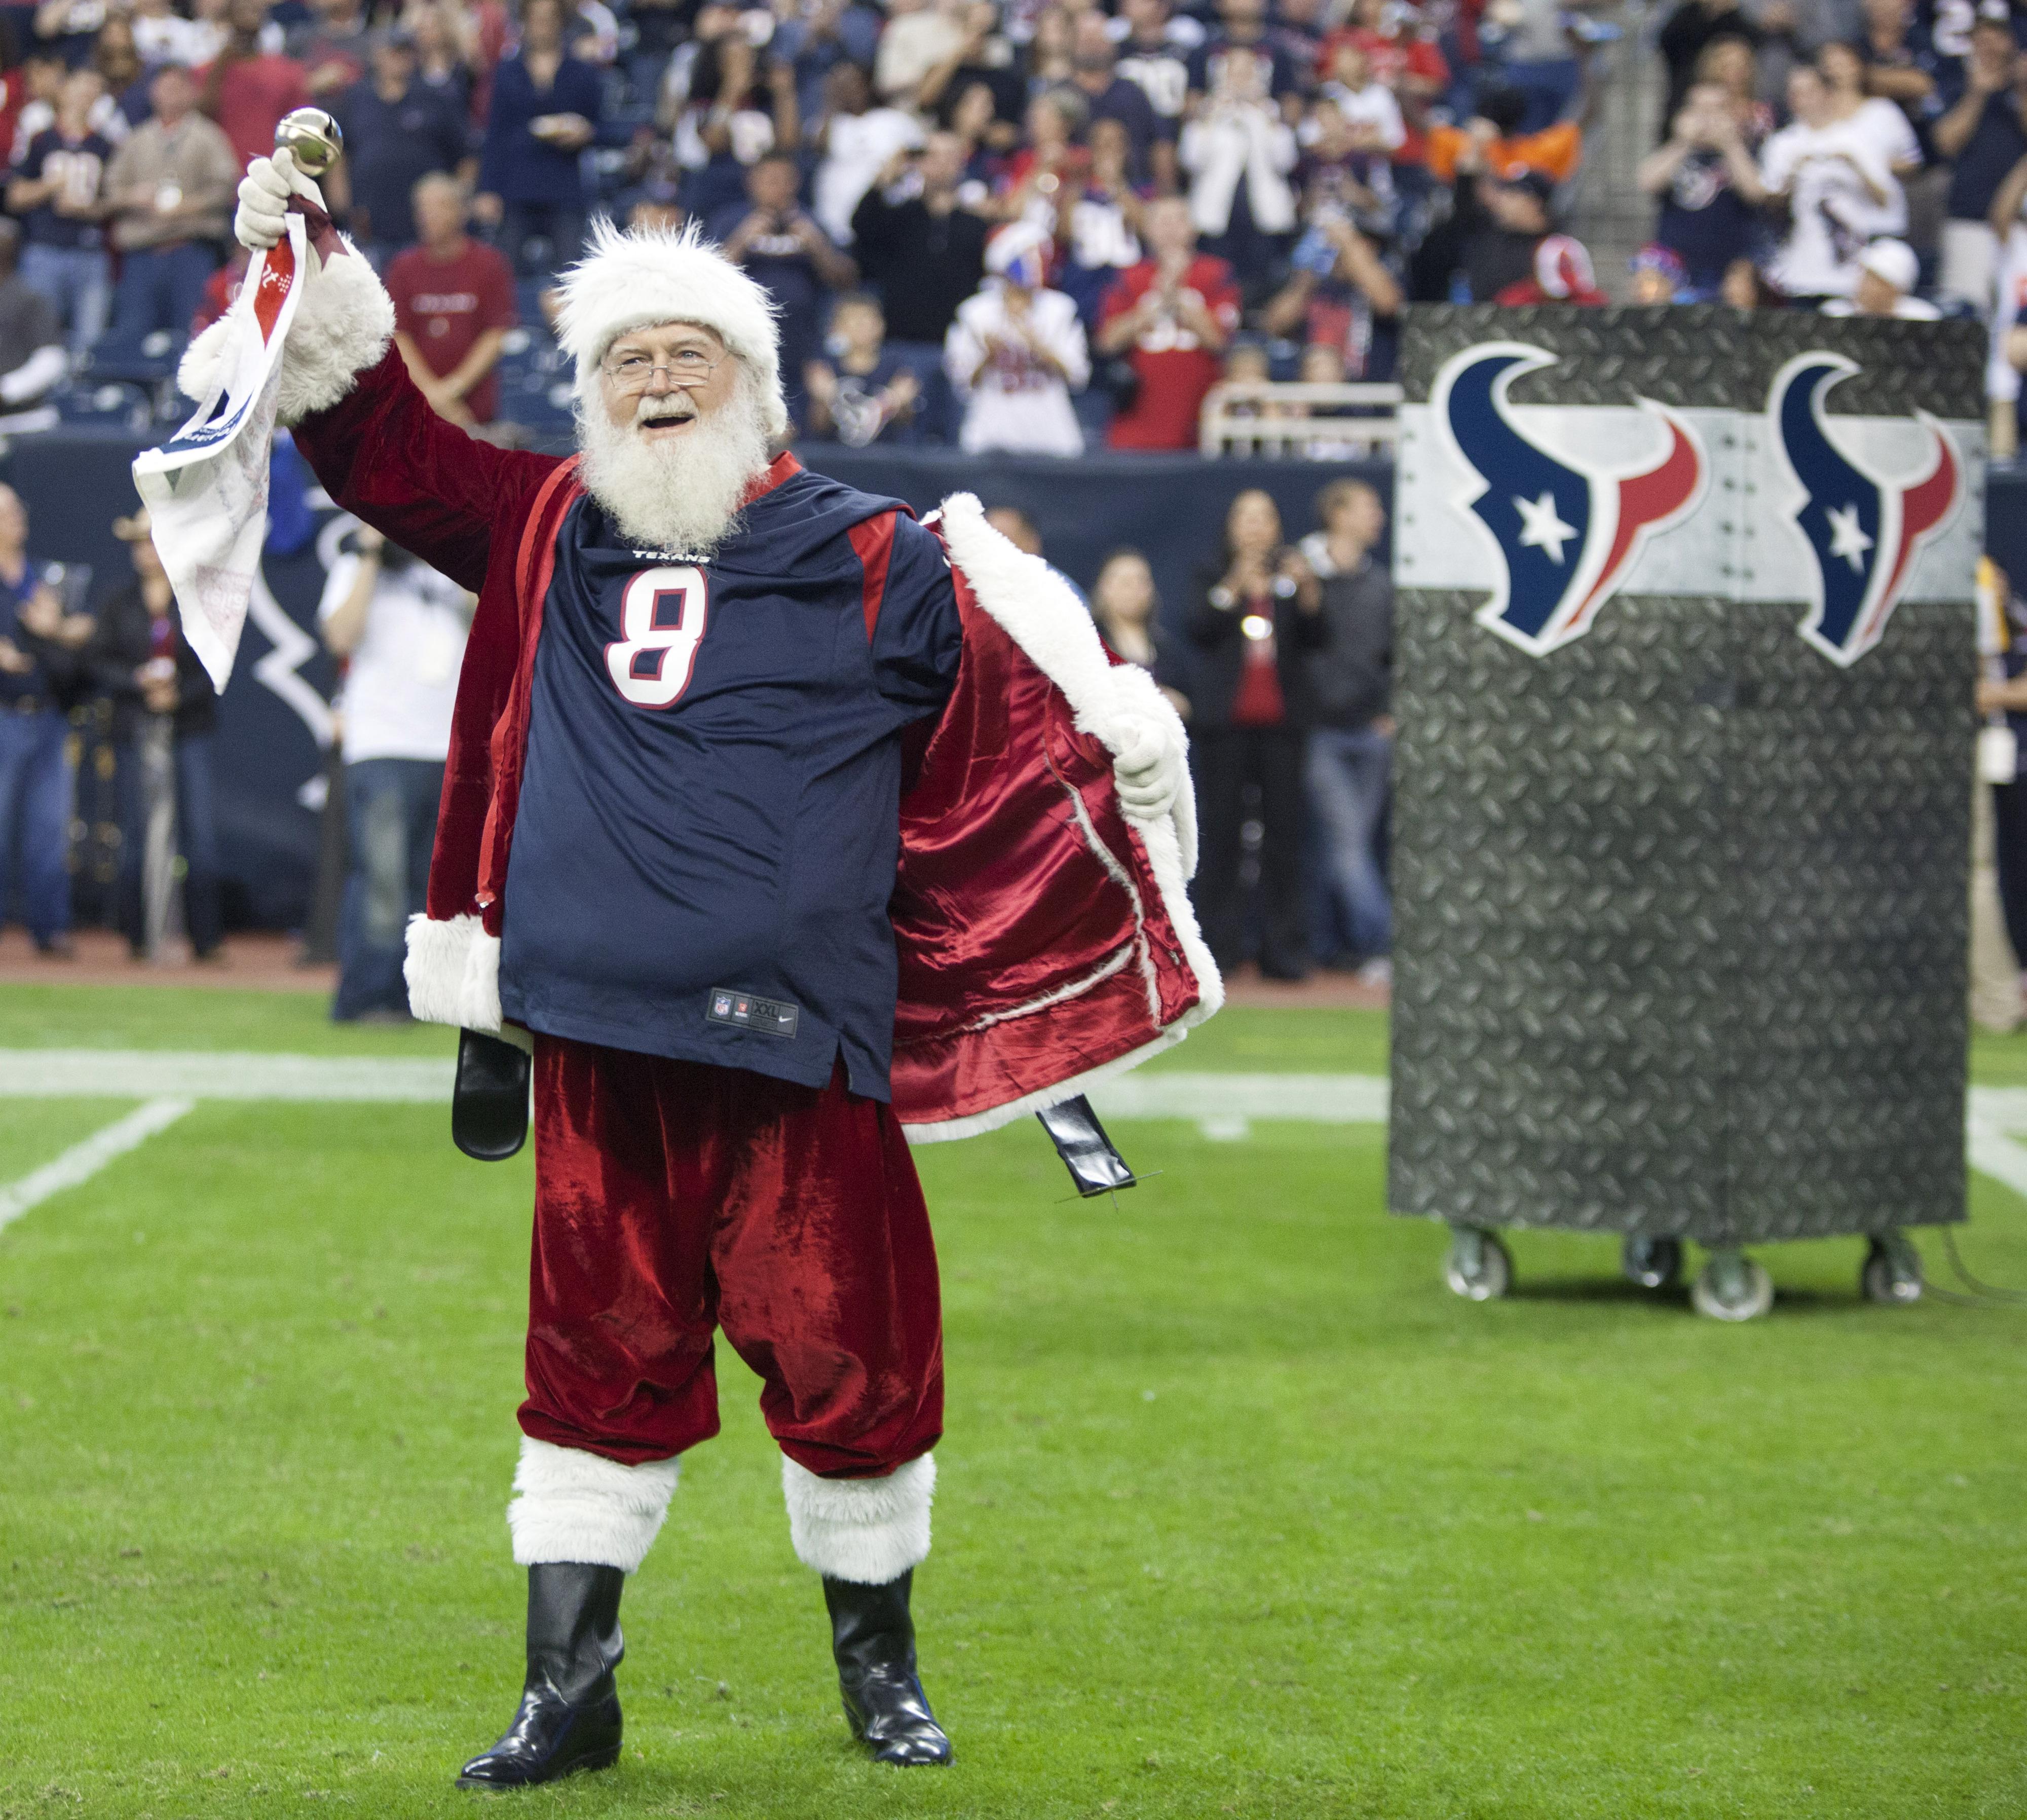 The Texans Gave Santa a Divisional Present This Year